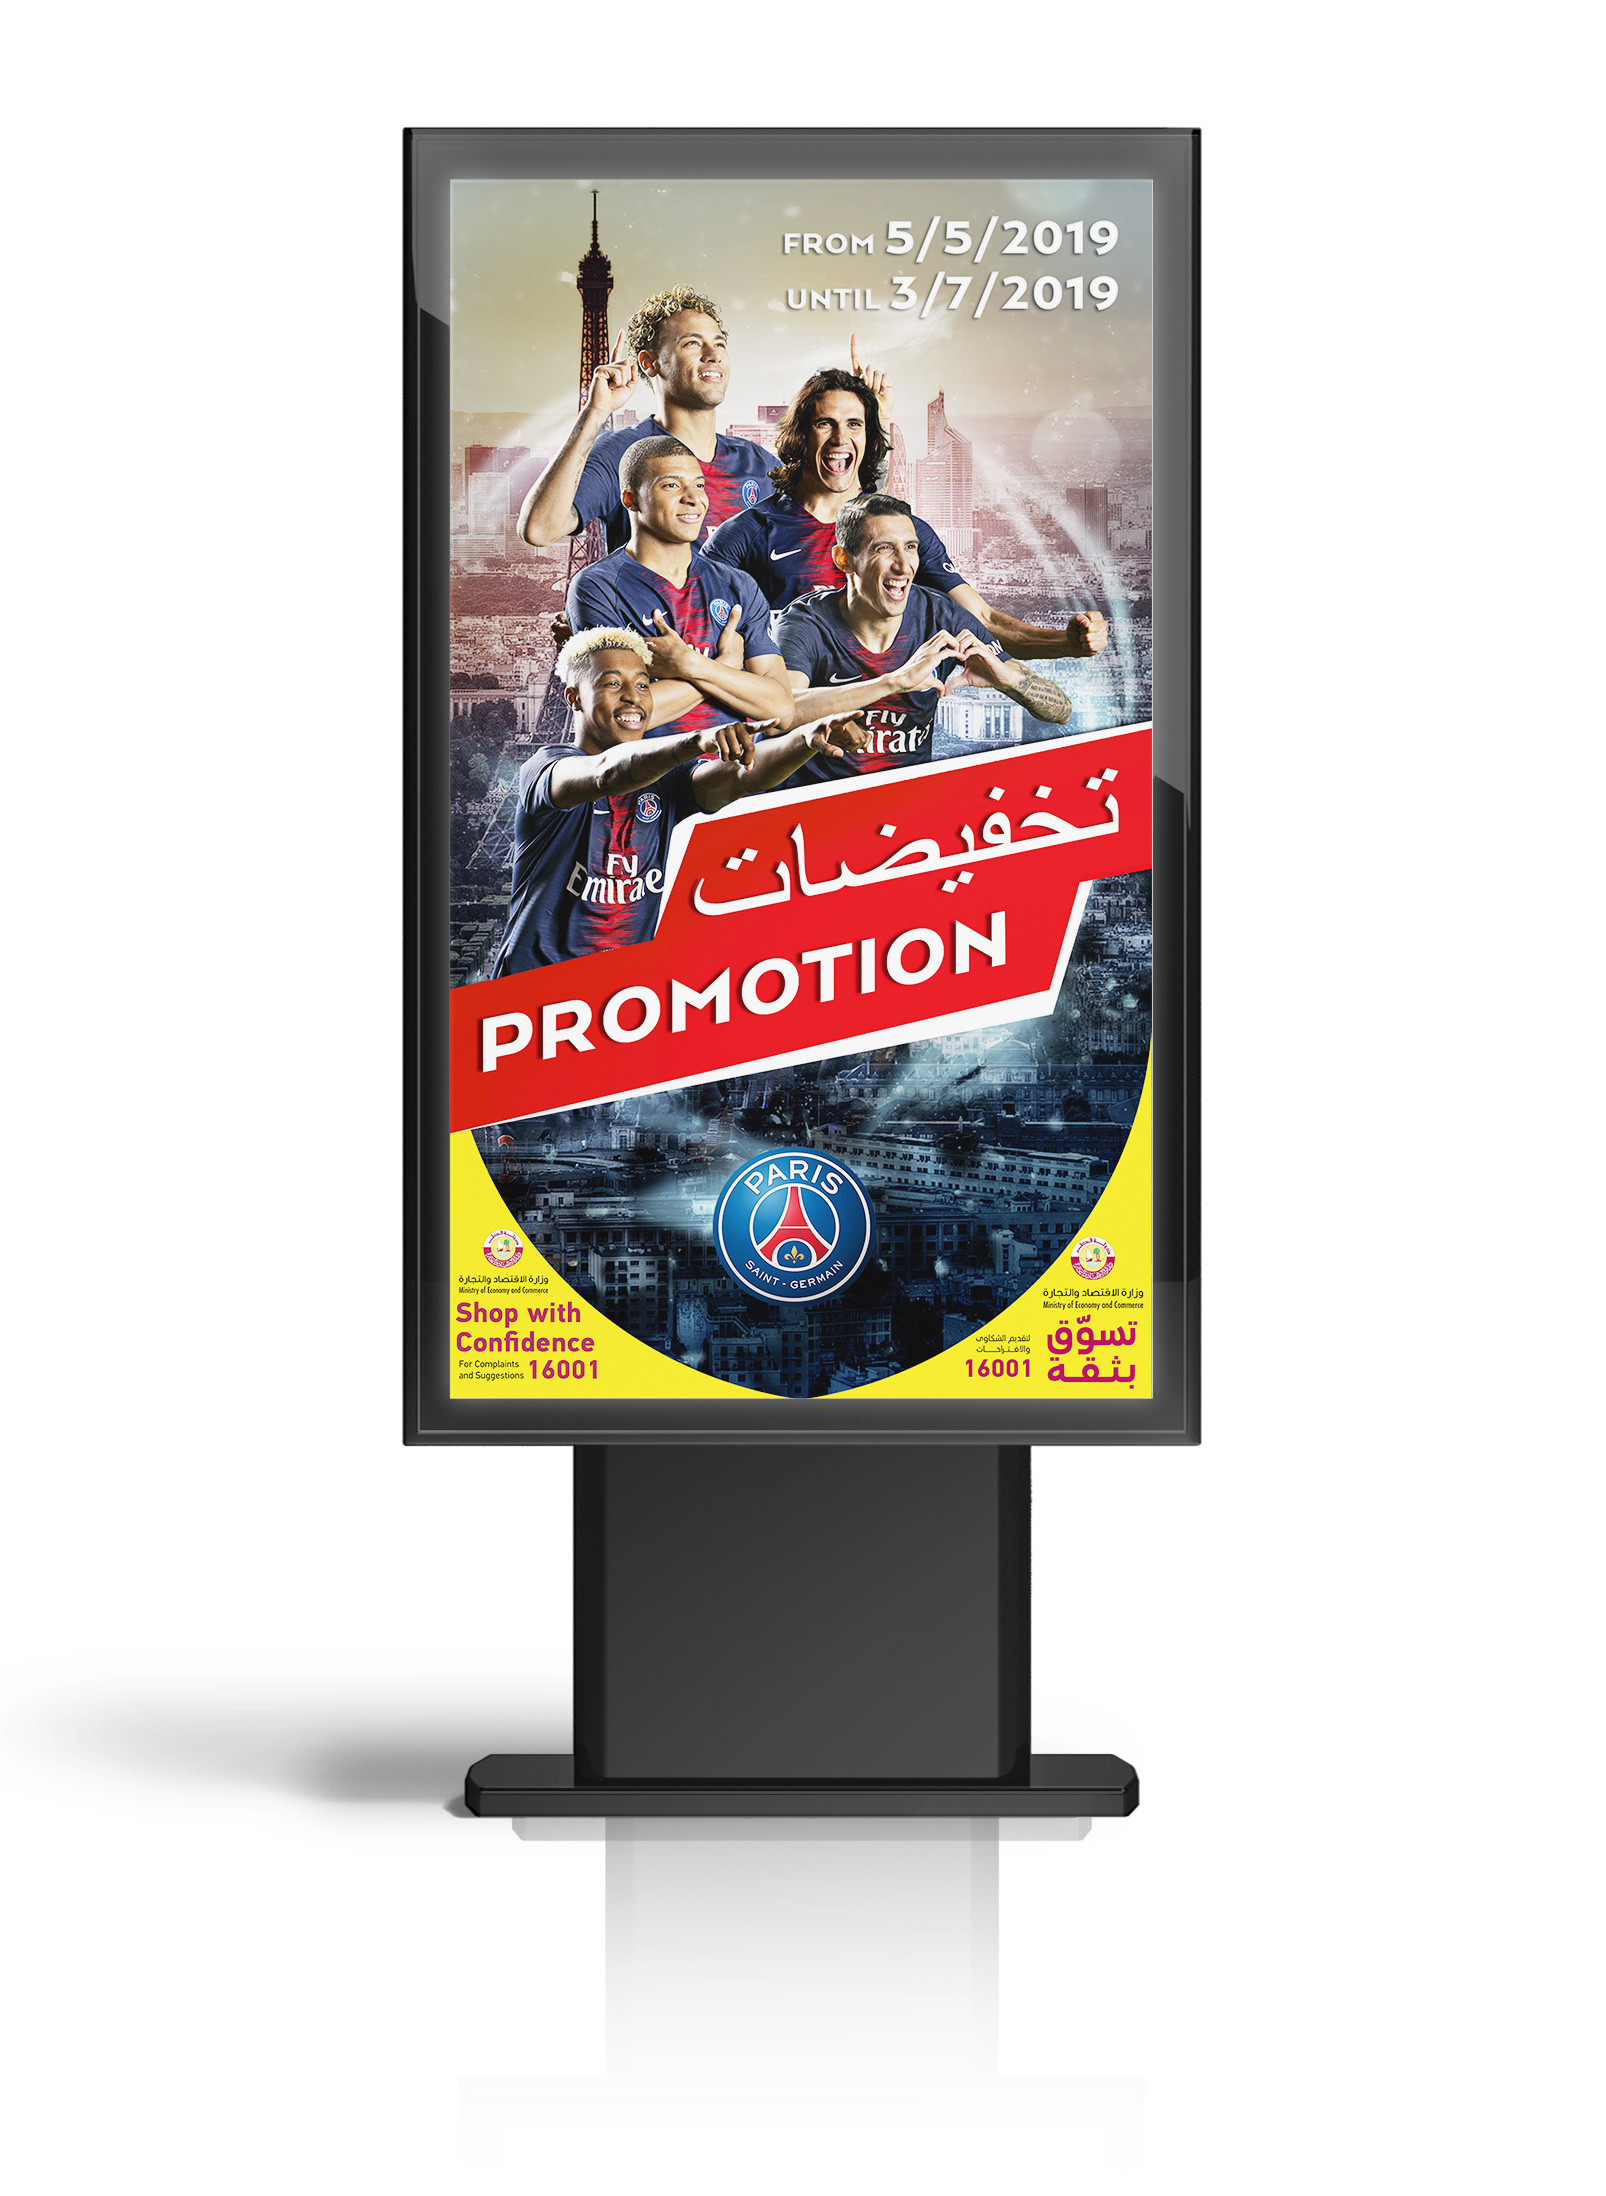 5-Promotion2-DOHA-PSGMERCH-0419